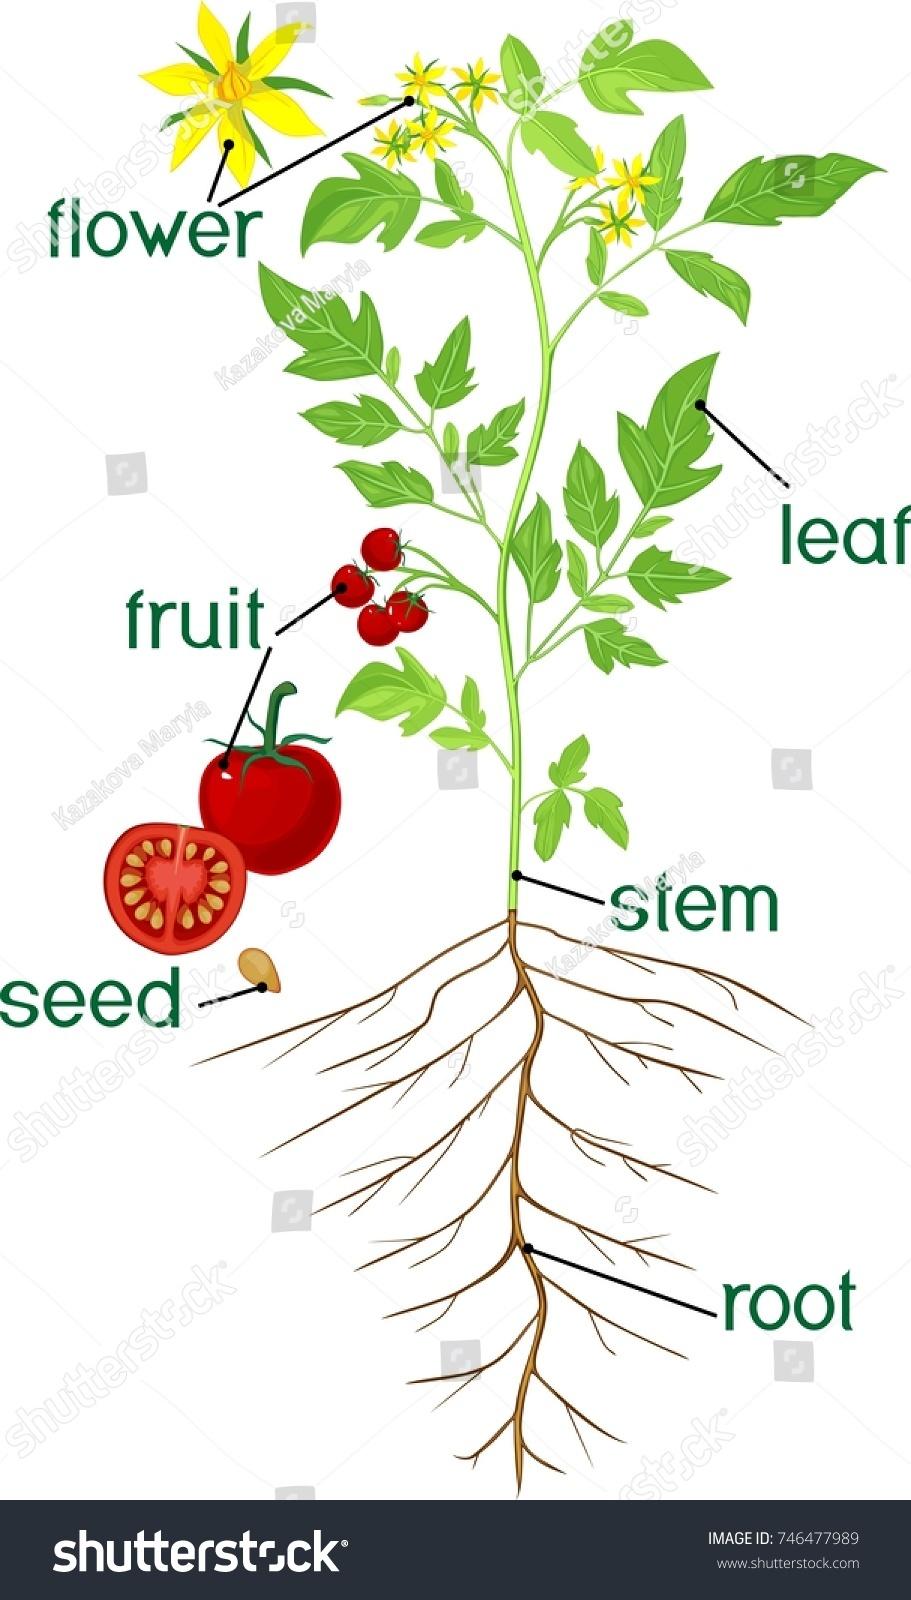 Parts Plant Morphology Flowering Tomato Plant Stock Vector 746477989